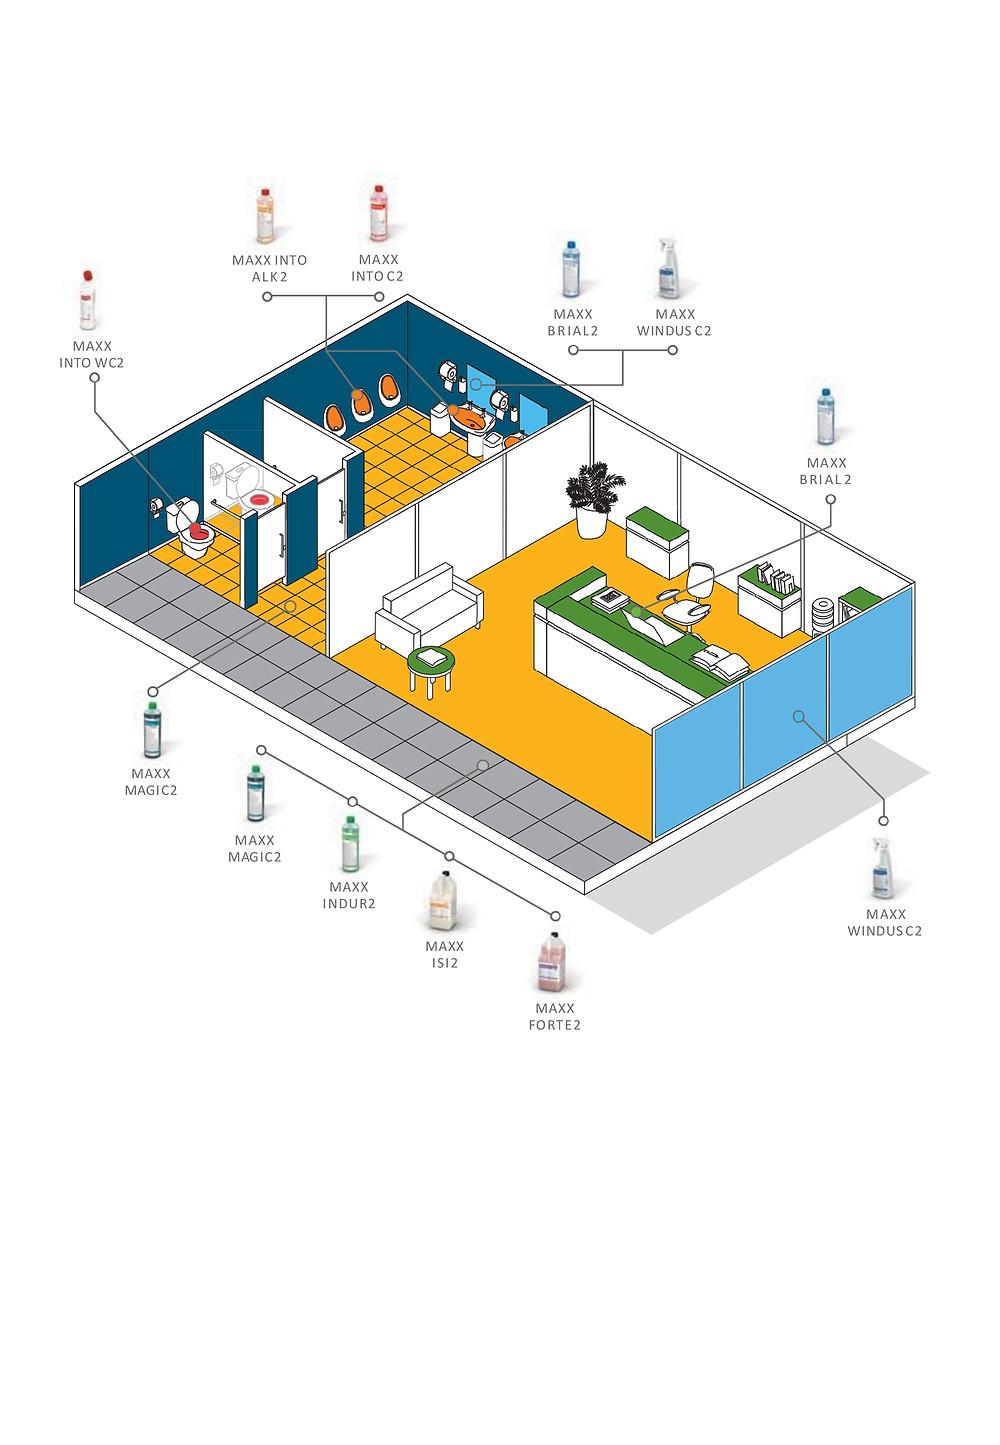 Система MAXX2 от Ecolab